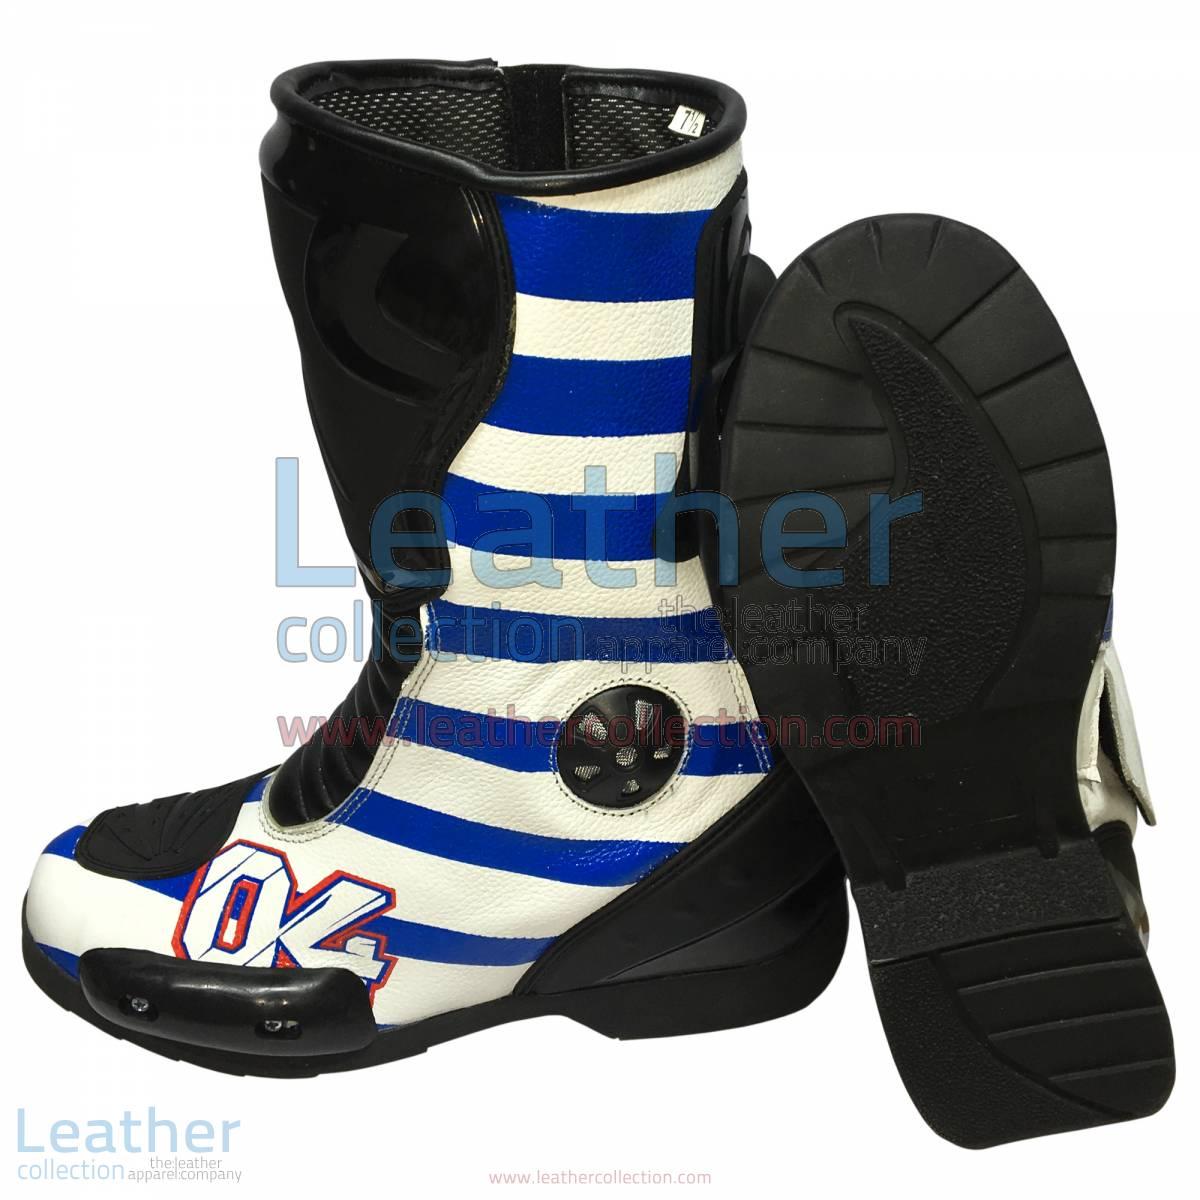 Andrea Dovizioso 2016 MotoGP Racing Boots